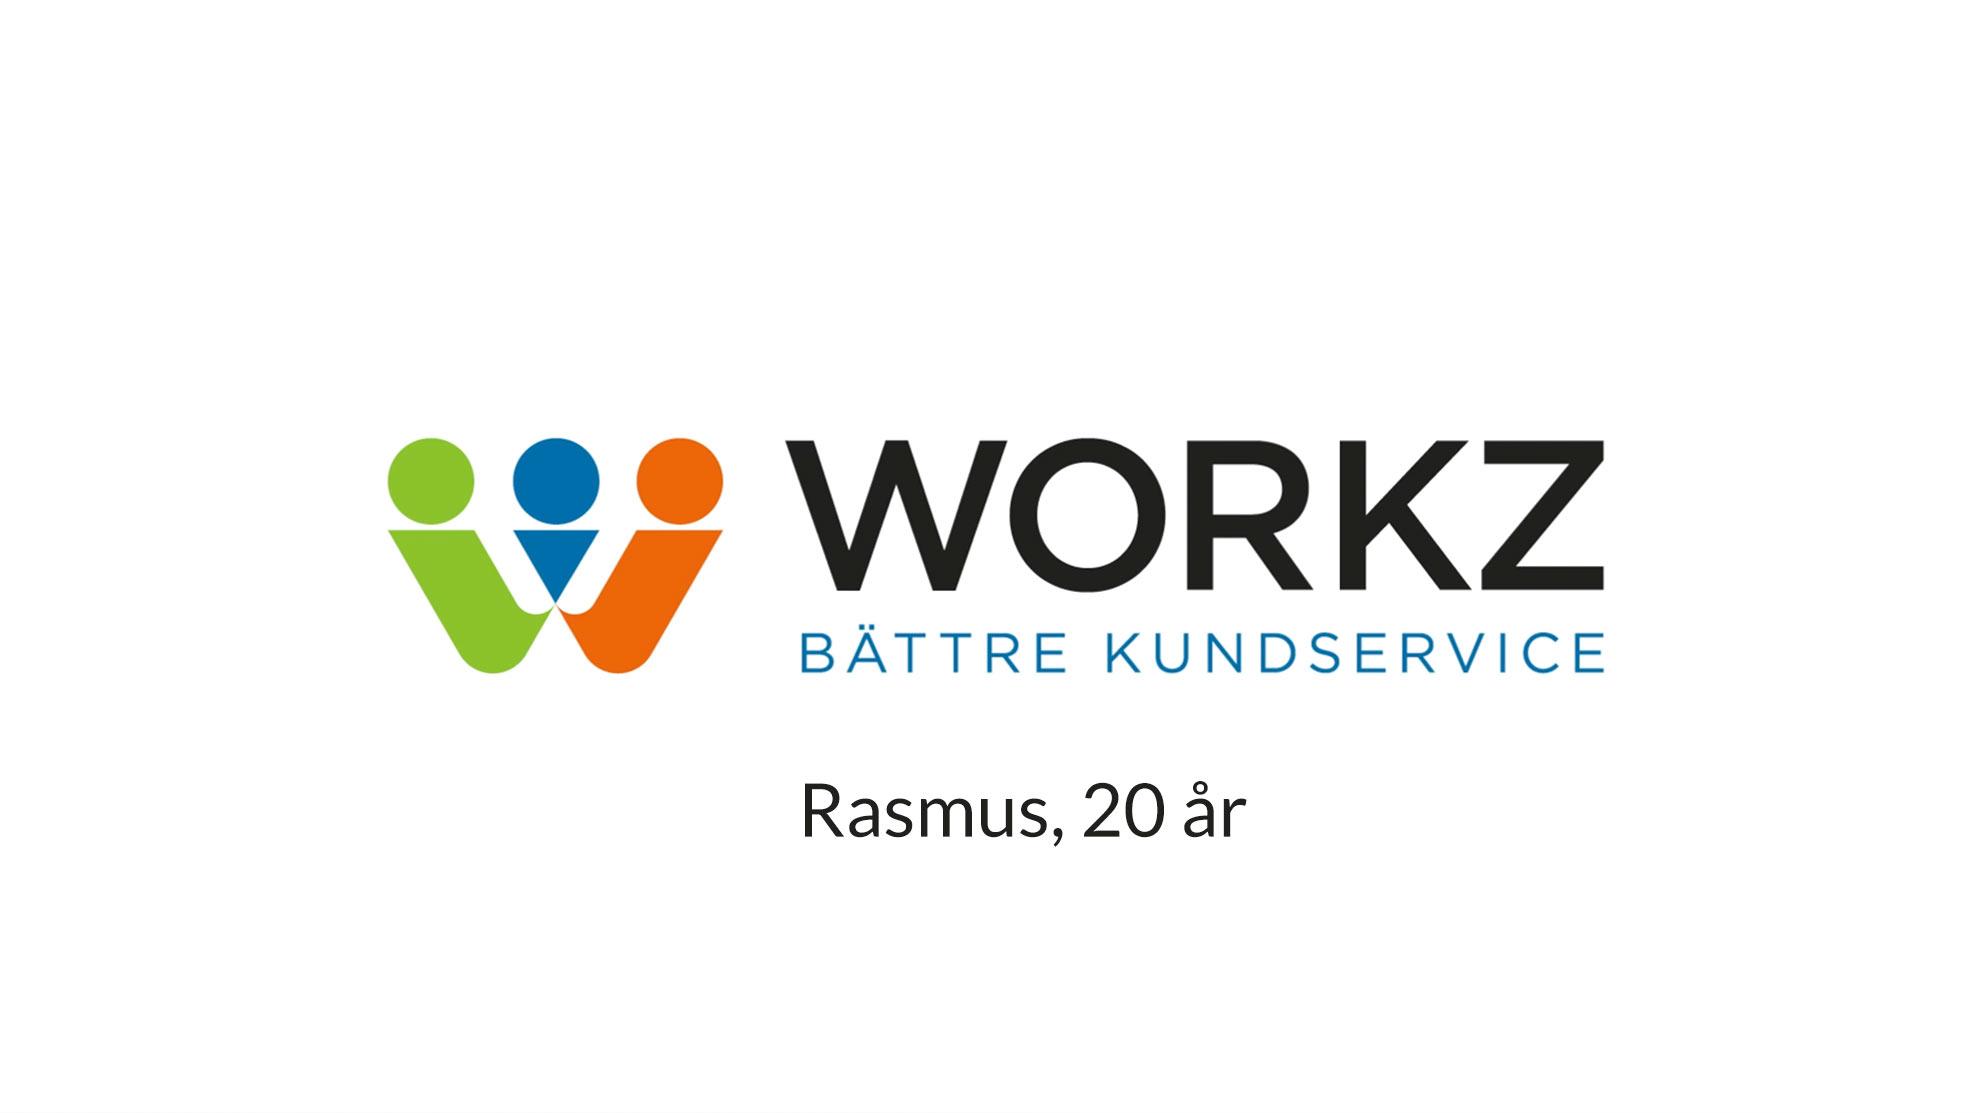 workz-rasmus-subtitles